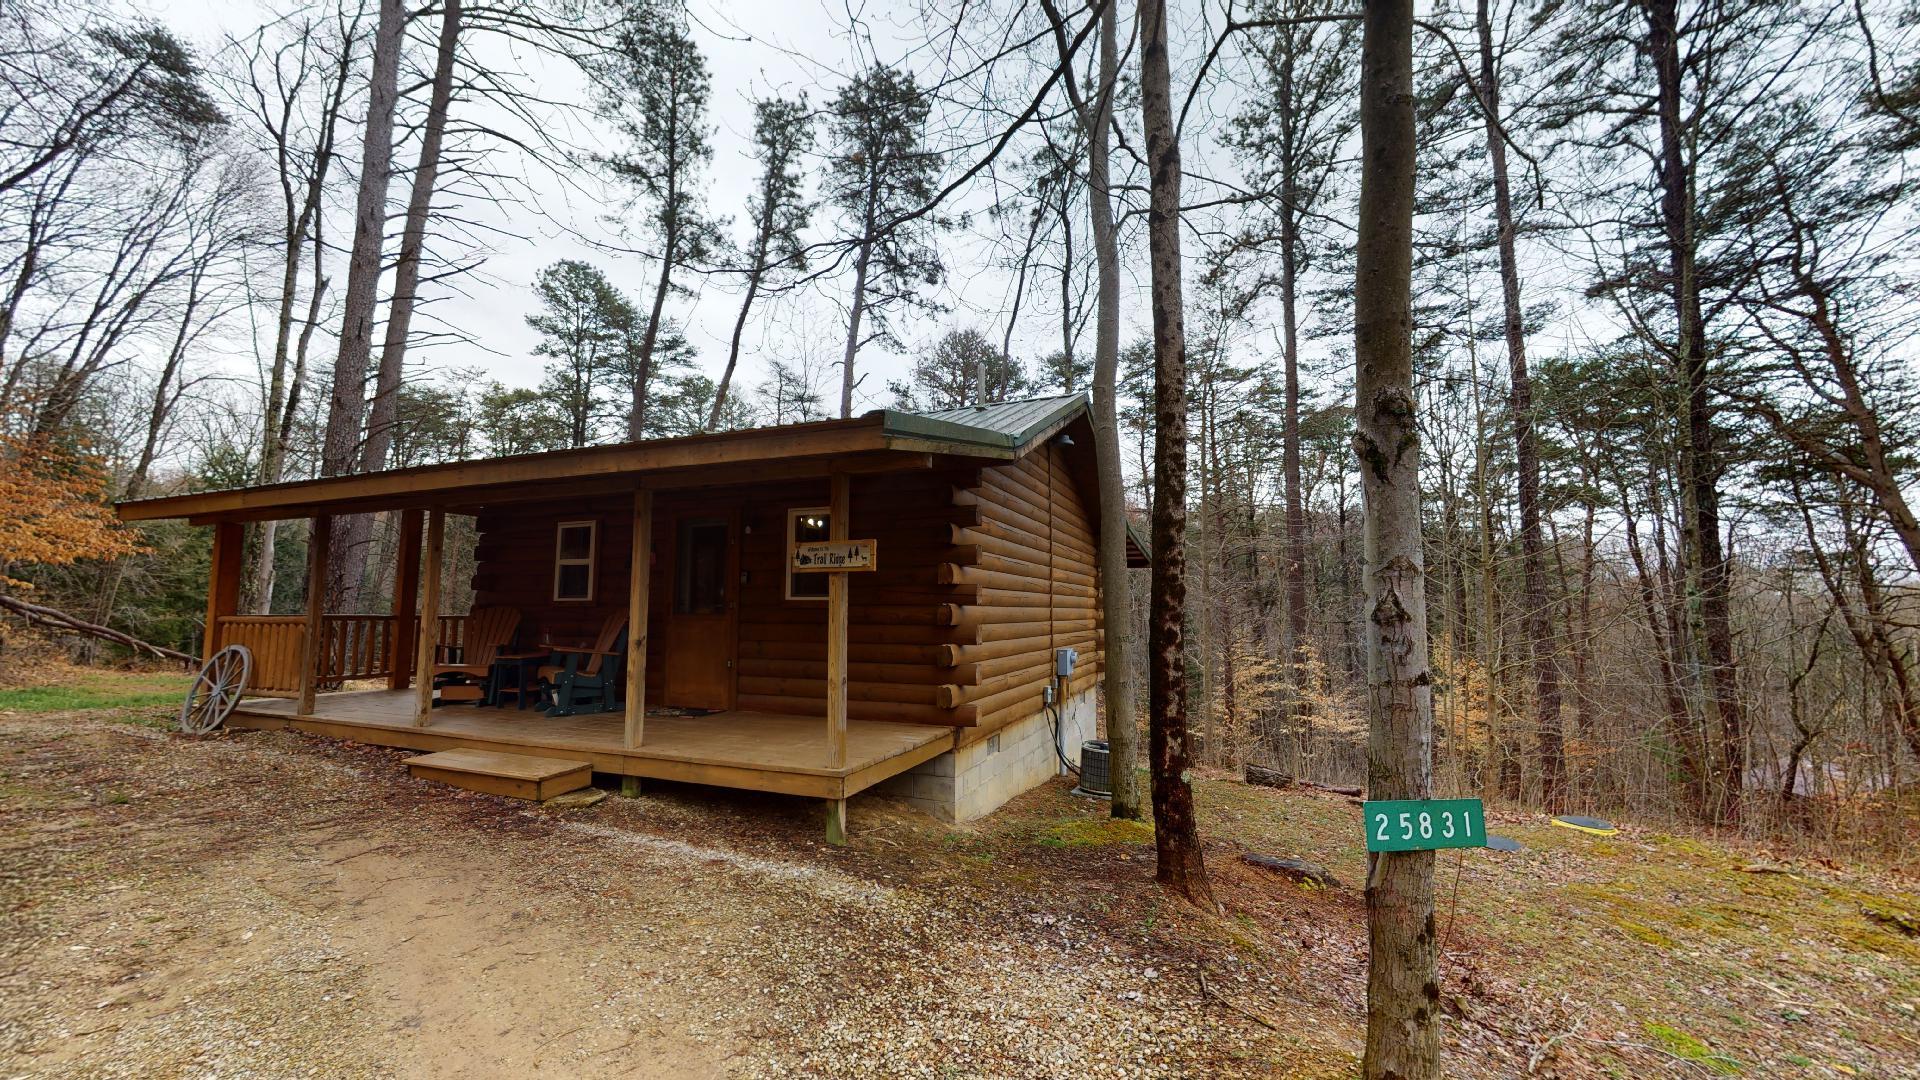 Trail Ridge Exterior Pet-friendly - Pet friendly under 30 lbs cabin.